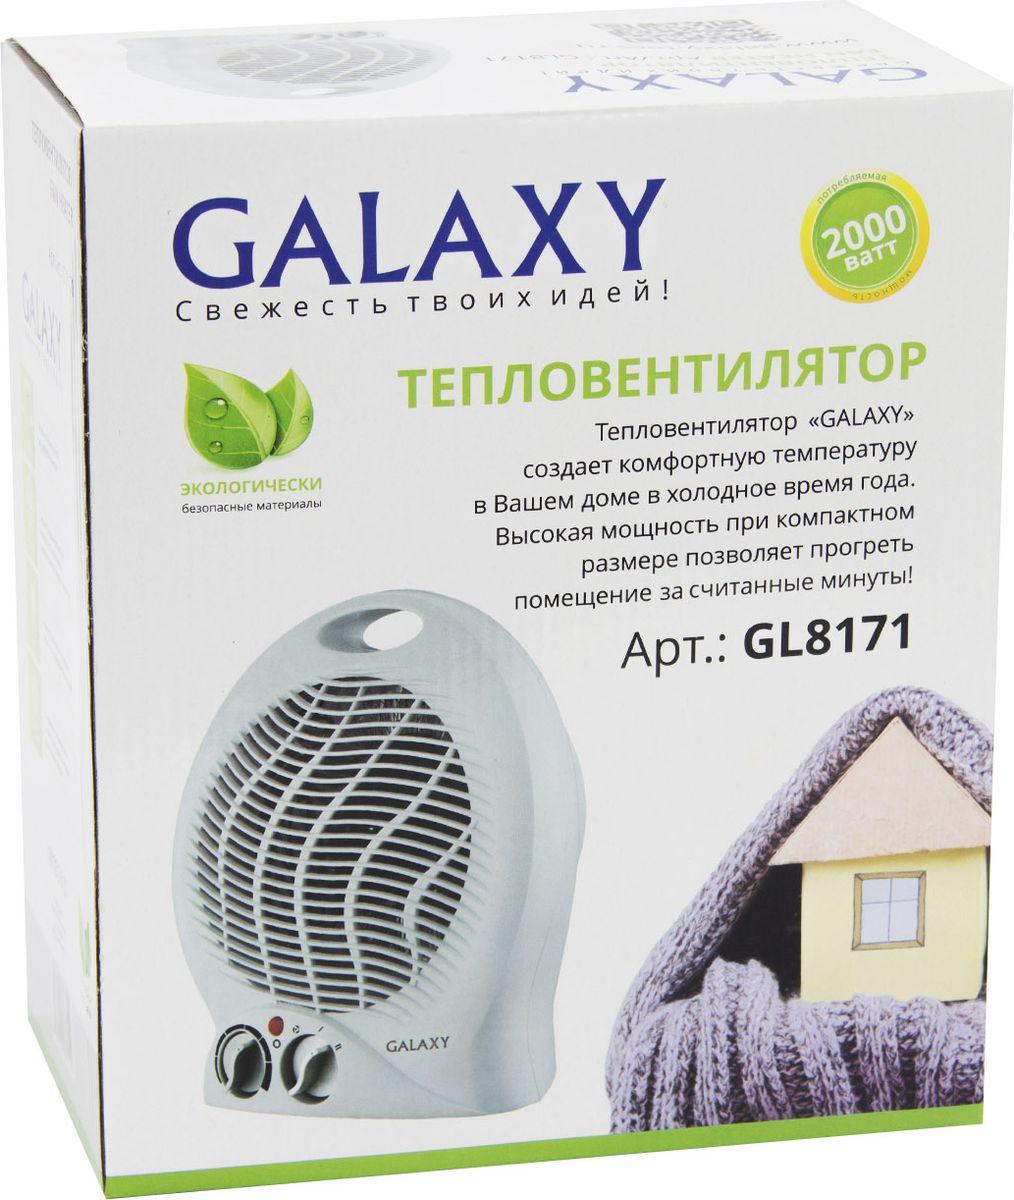 Galaxy GL 8171тепловентилятор Galaxy